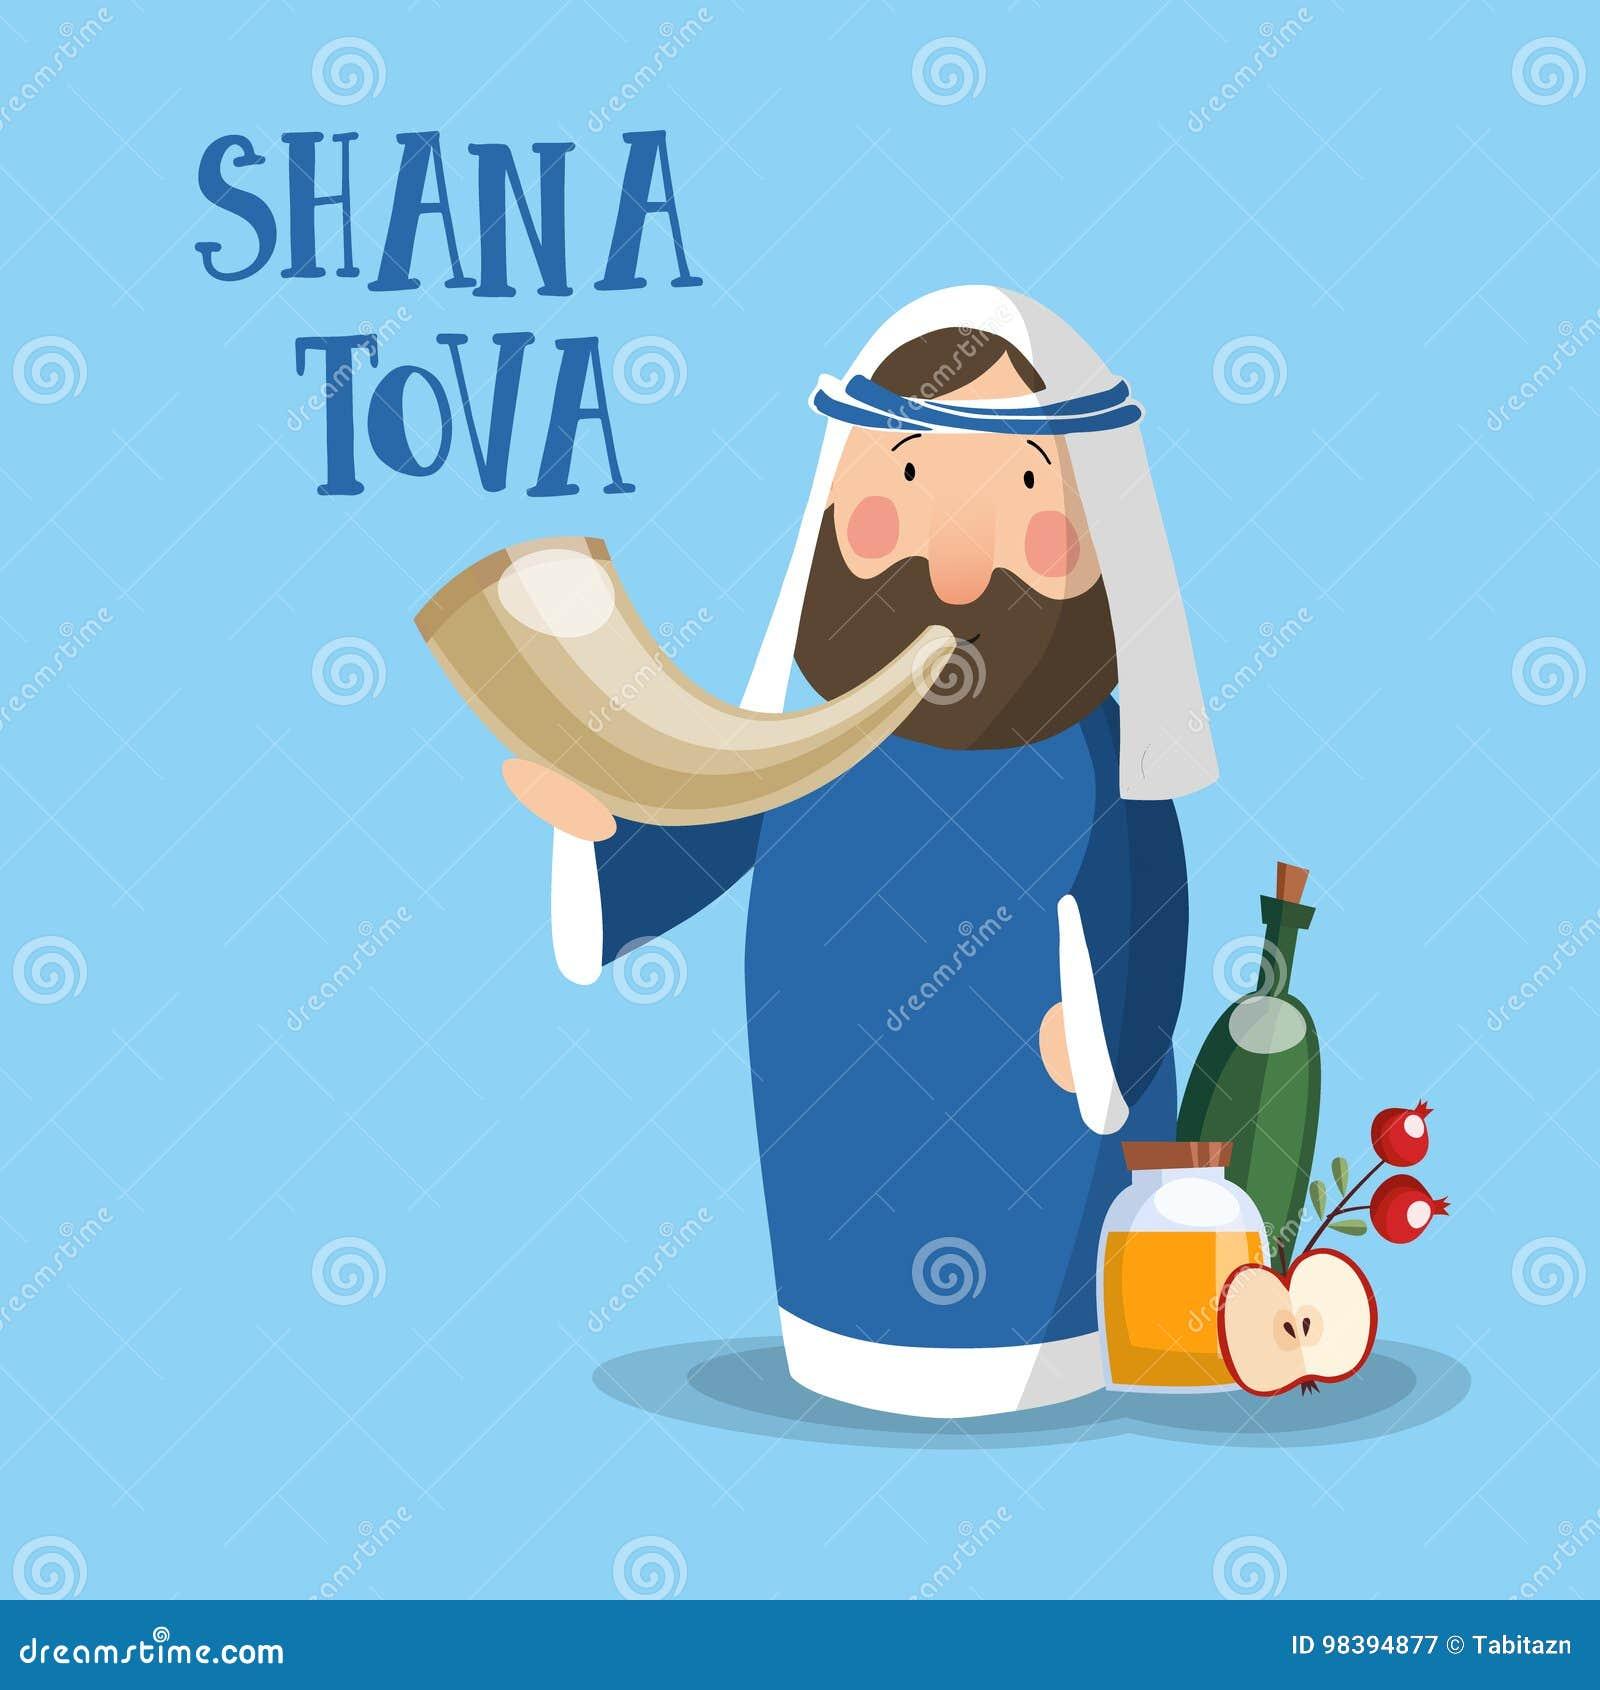 Shana tova greeting card invitation for jewish new year holiday shana tova greeting card invitation for jewish new year holiday rosh hashanah cartoon of a rabbi blowing a shofar horn kristyandbryce Images